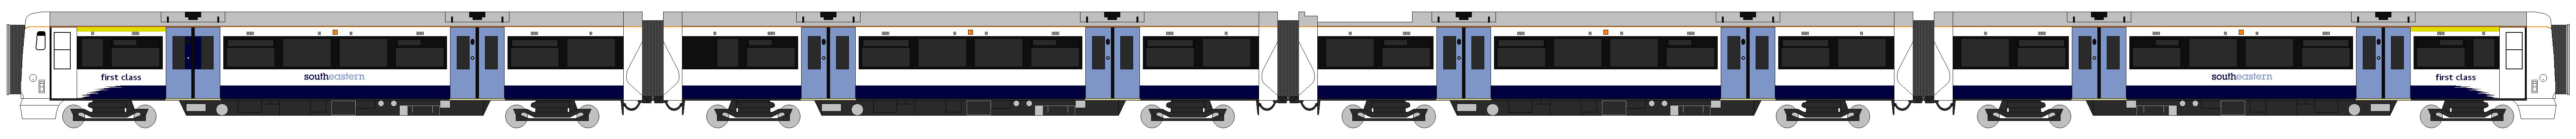 electrostar Logo photo - 1